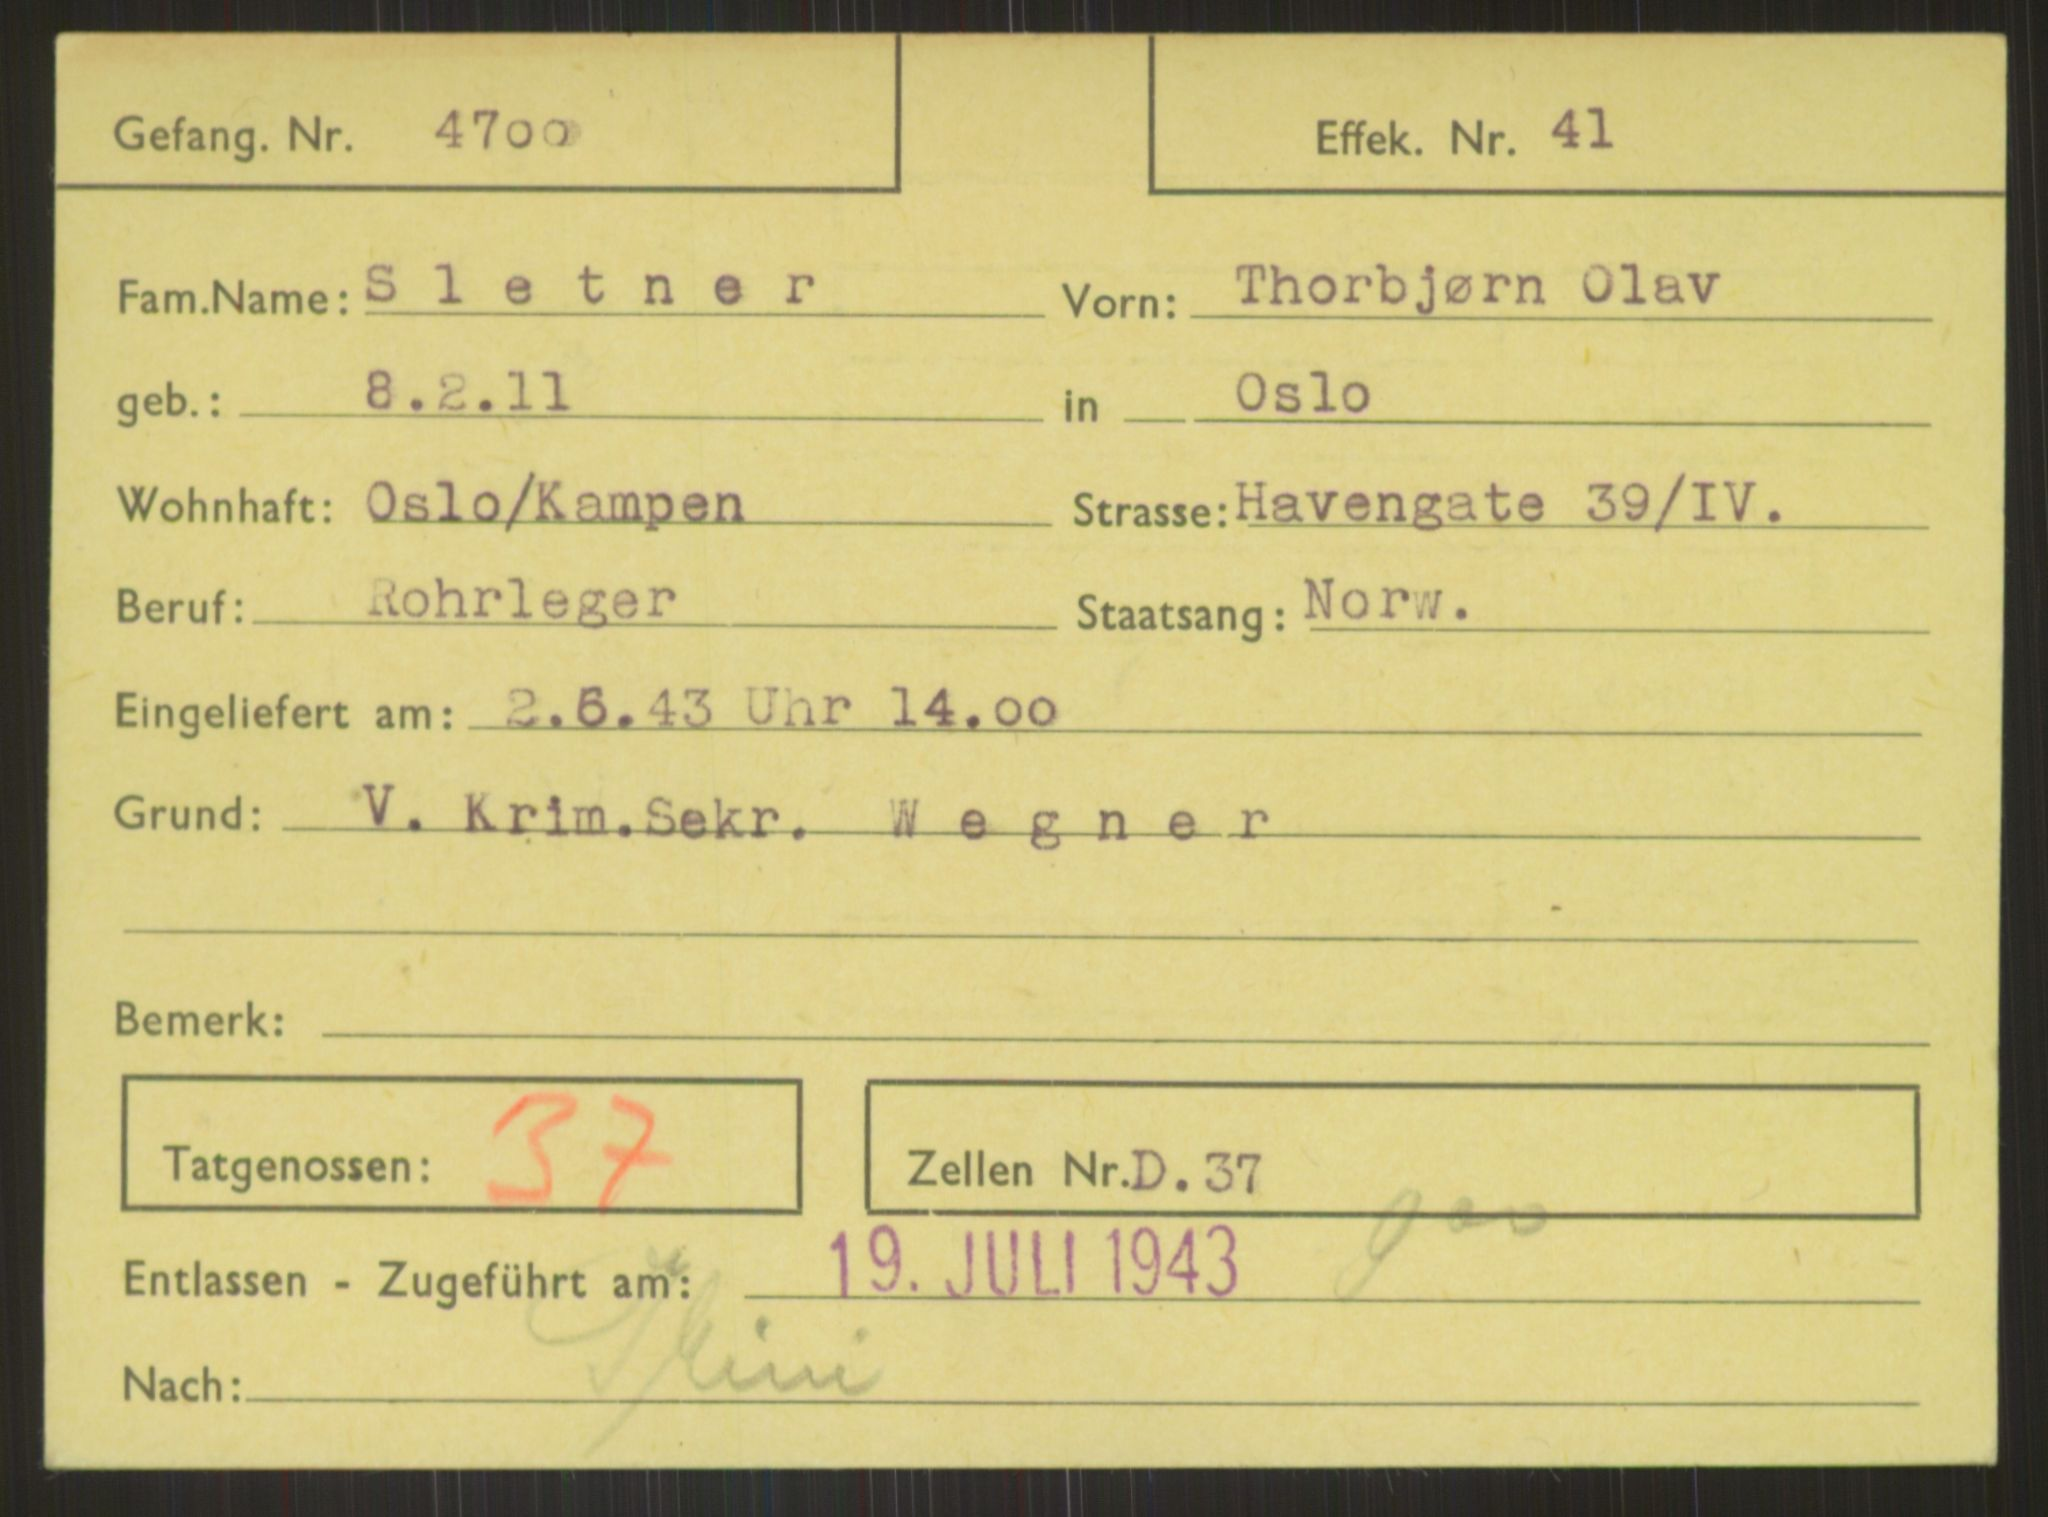 RA, Befehlshaber der Sicherheitspolizei und des SD, E/Ea/Eab/L0005: Register over norske fanger i Møllergata 19 ordnet etter fangenummer: 4700-5499, 1940-1945